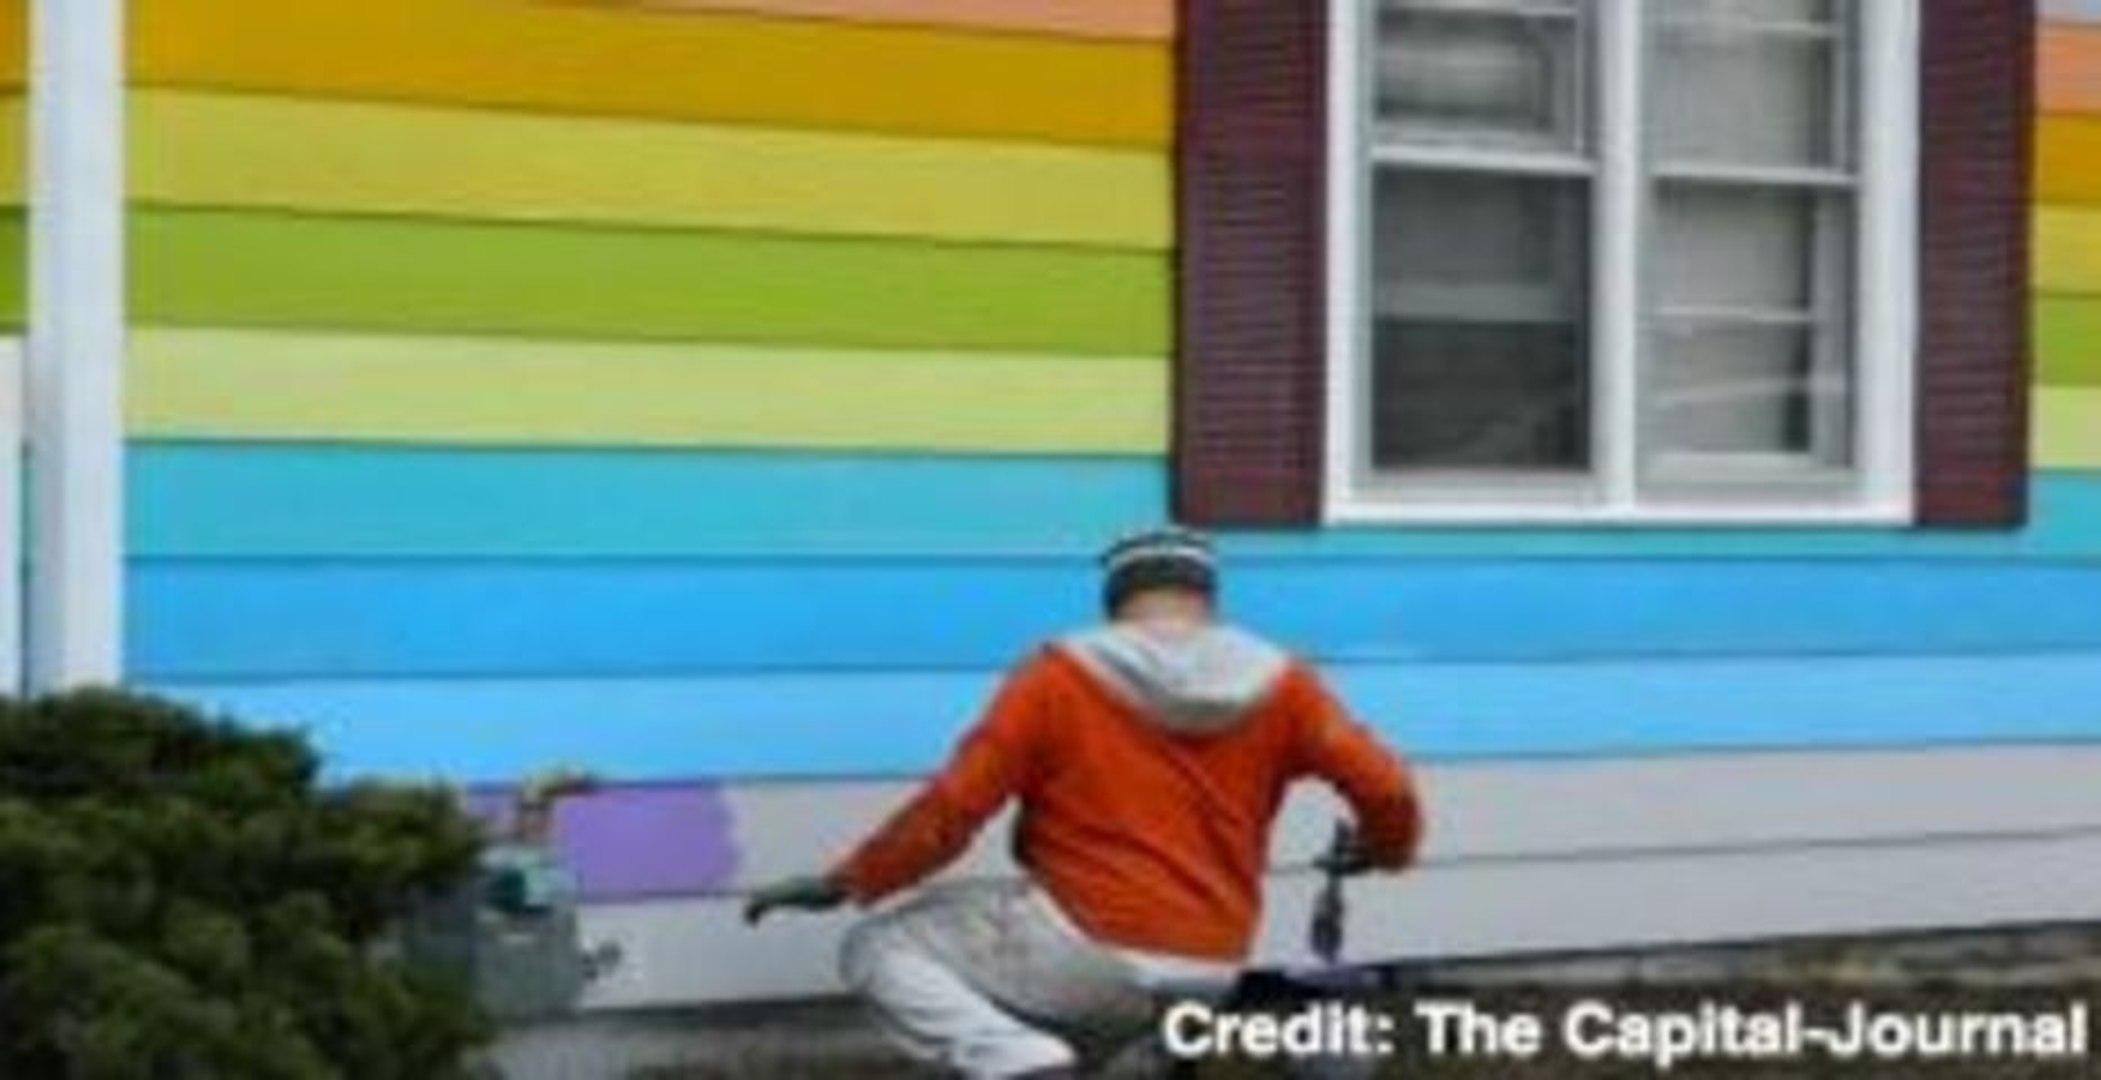 Non-Profit Paints Rainbow House by Westboro Baptist Church